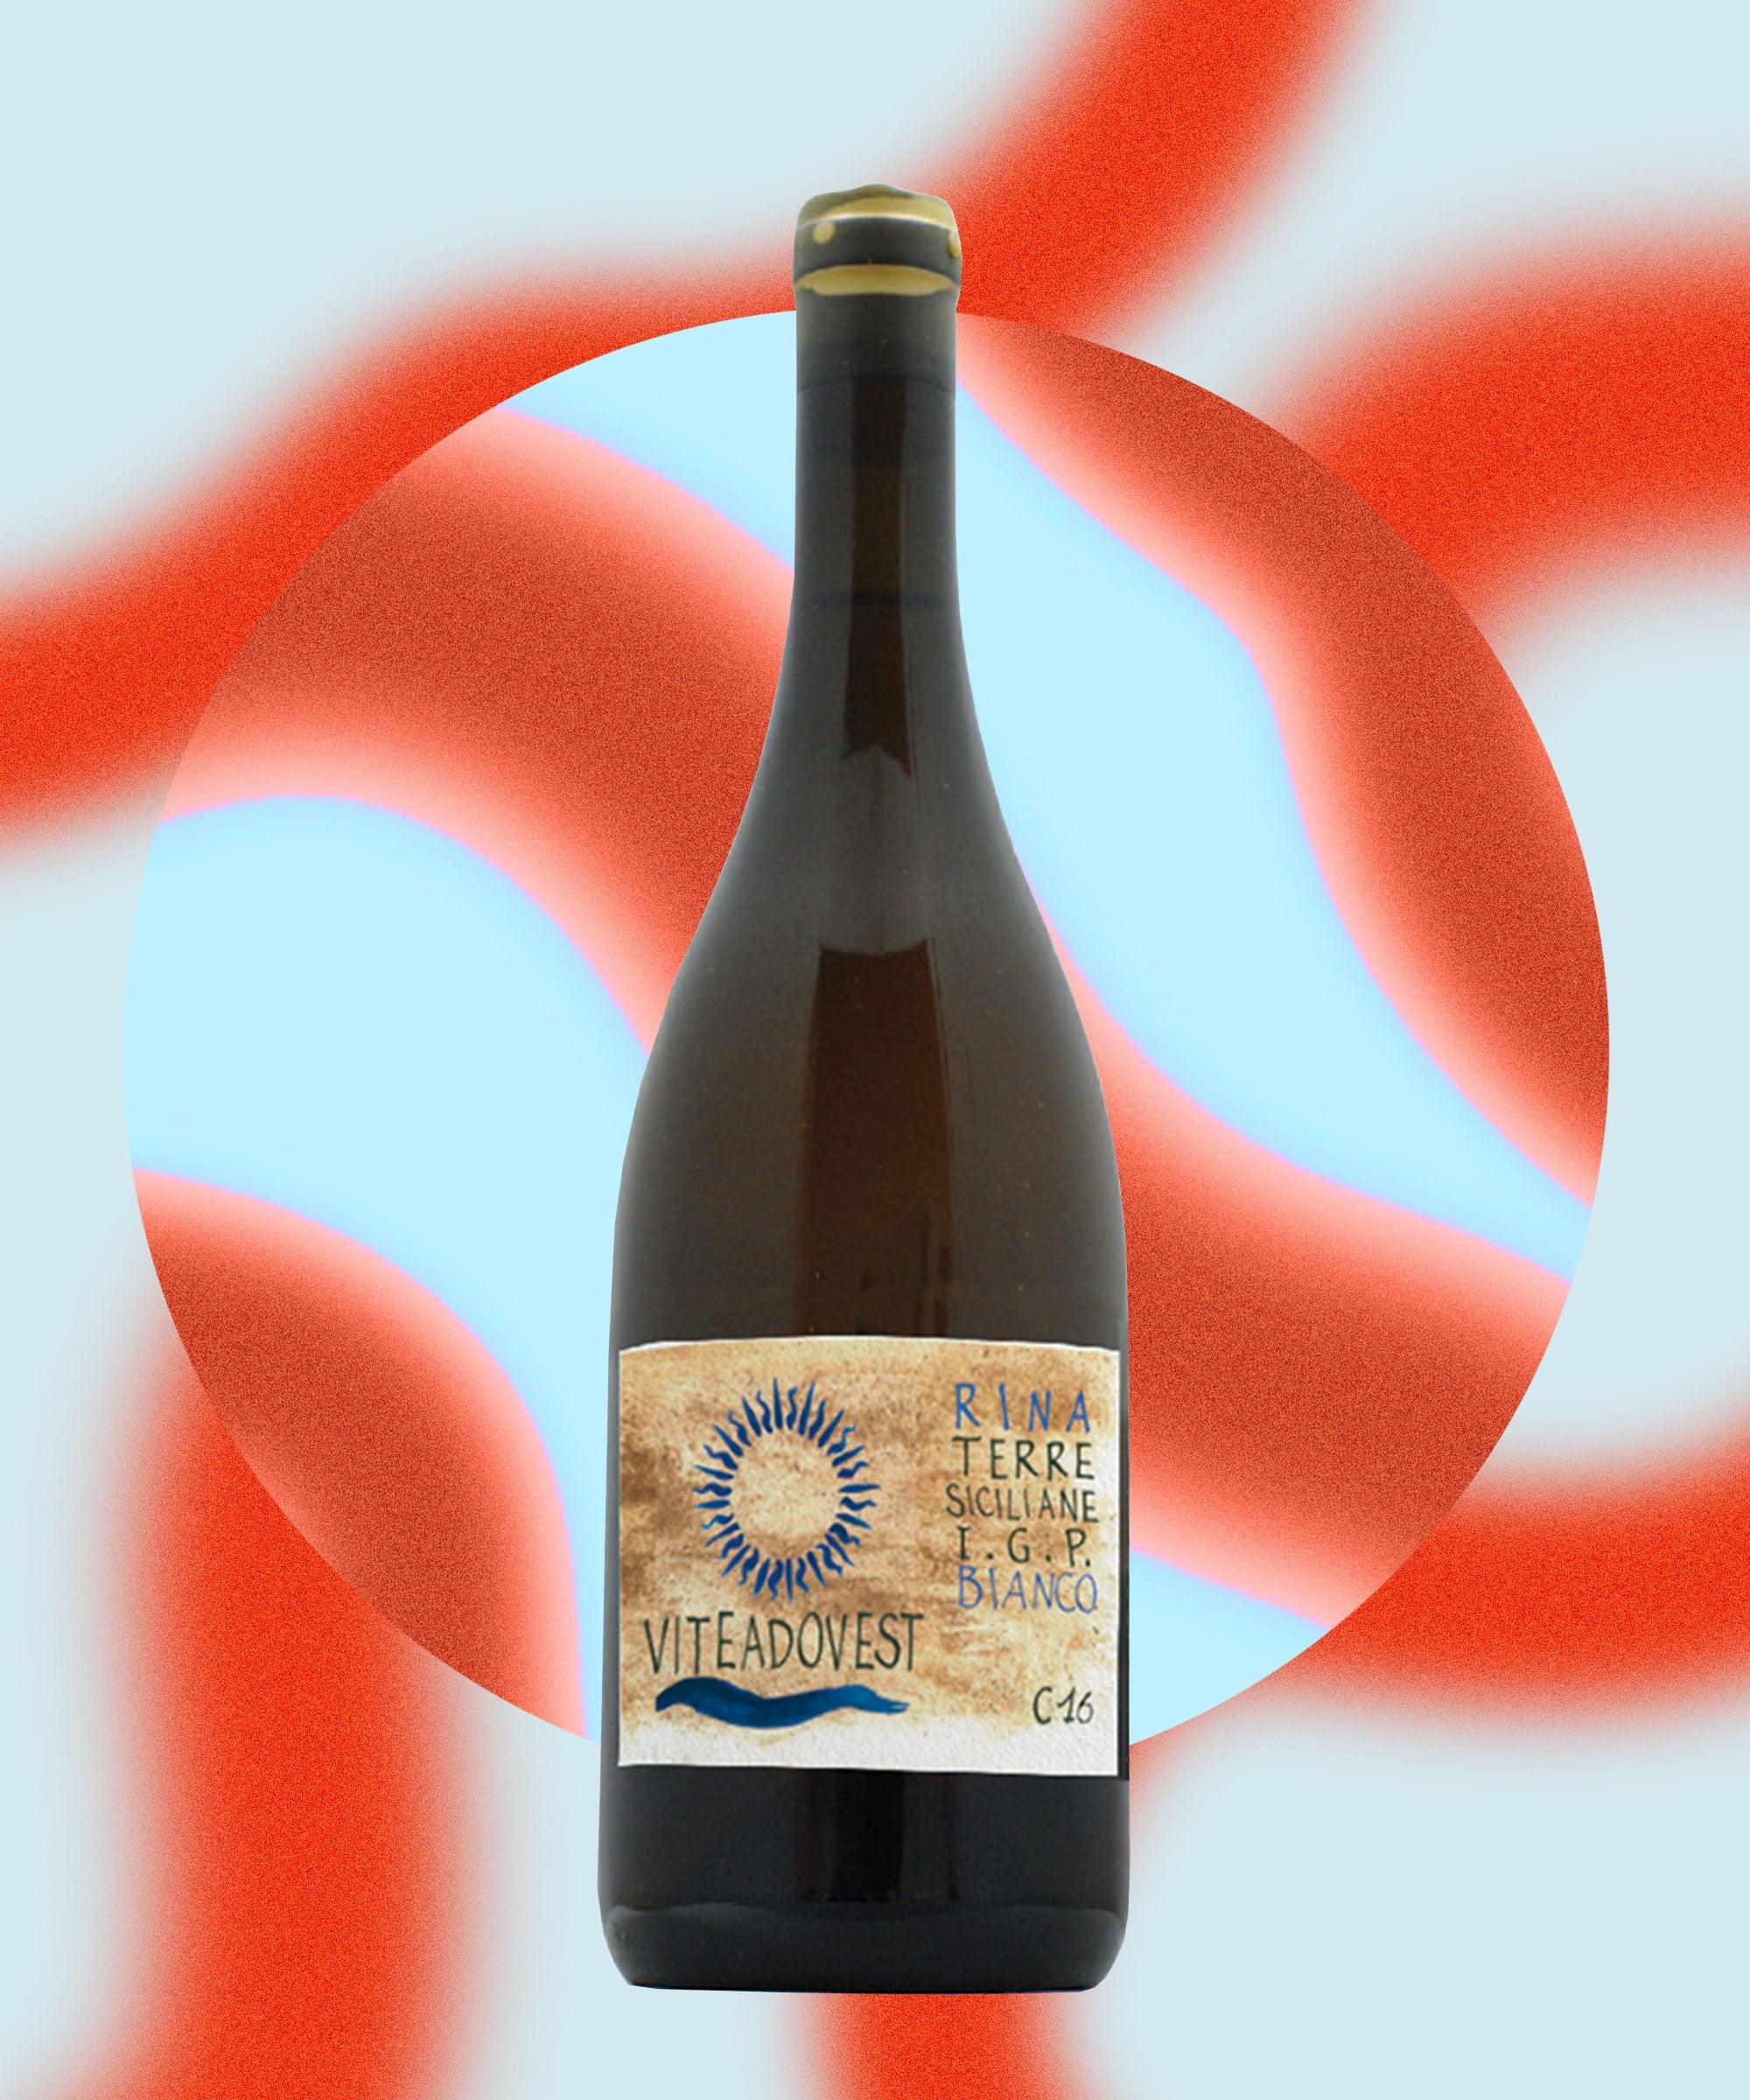 The Best Under-$30 Orange Wines, According To Wine Experts